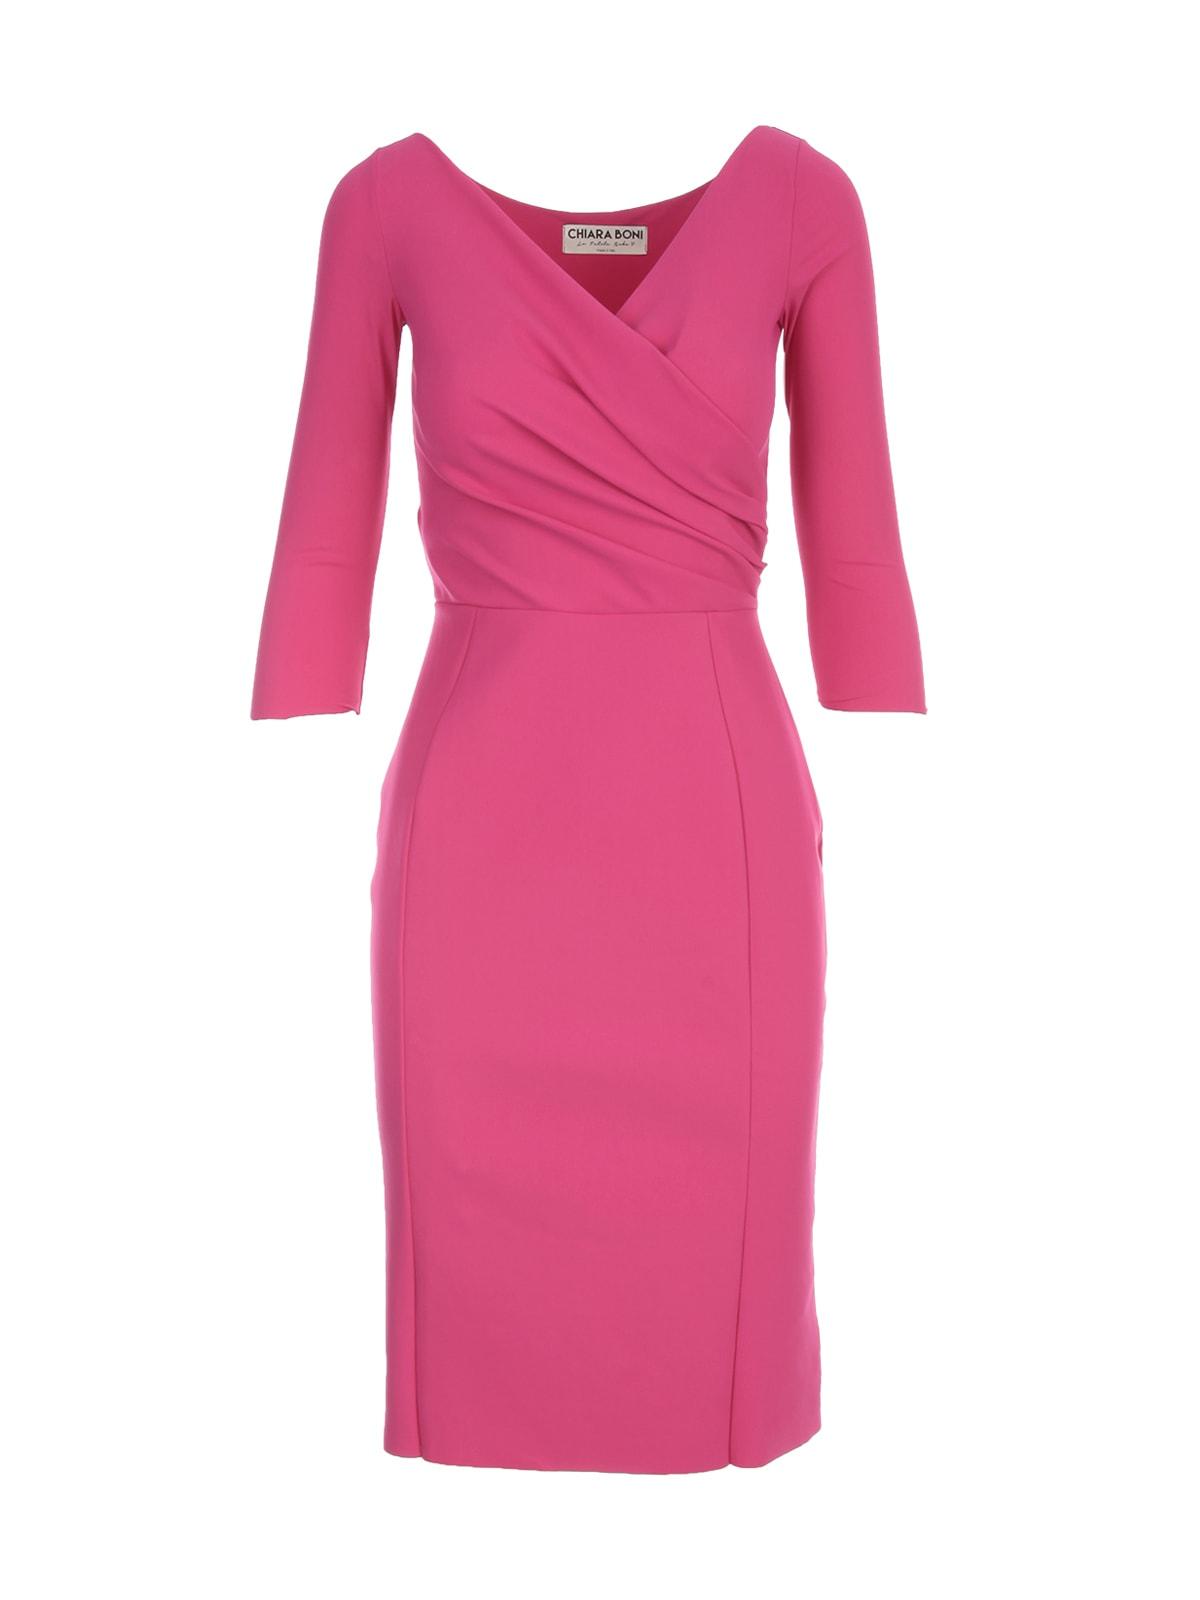 Pencil V Neck 3/4s Dress